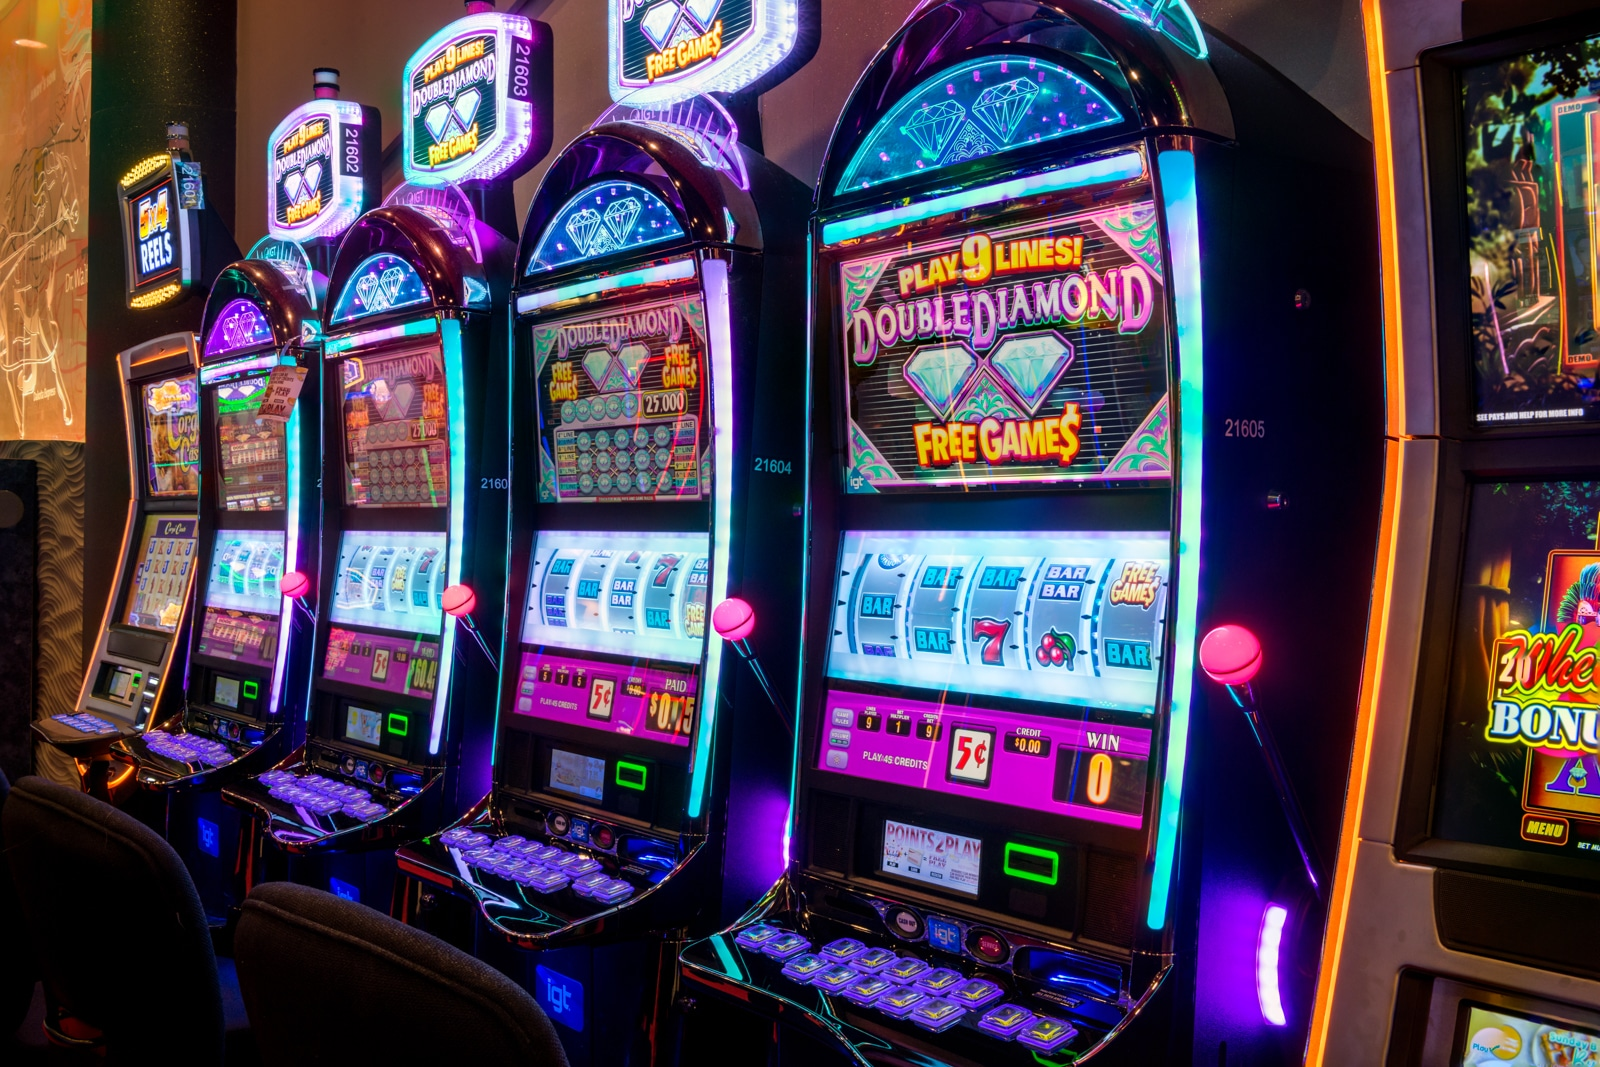 Red Shores Casino slot machines